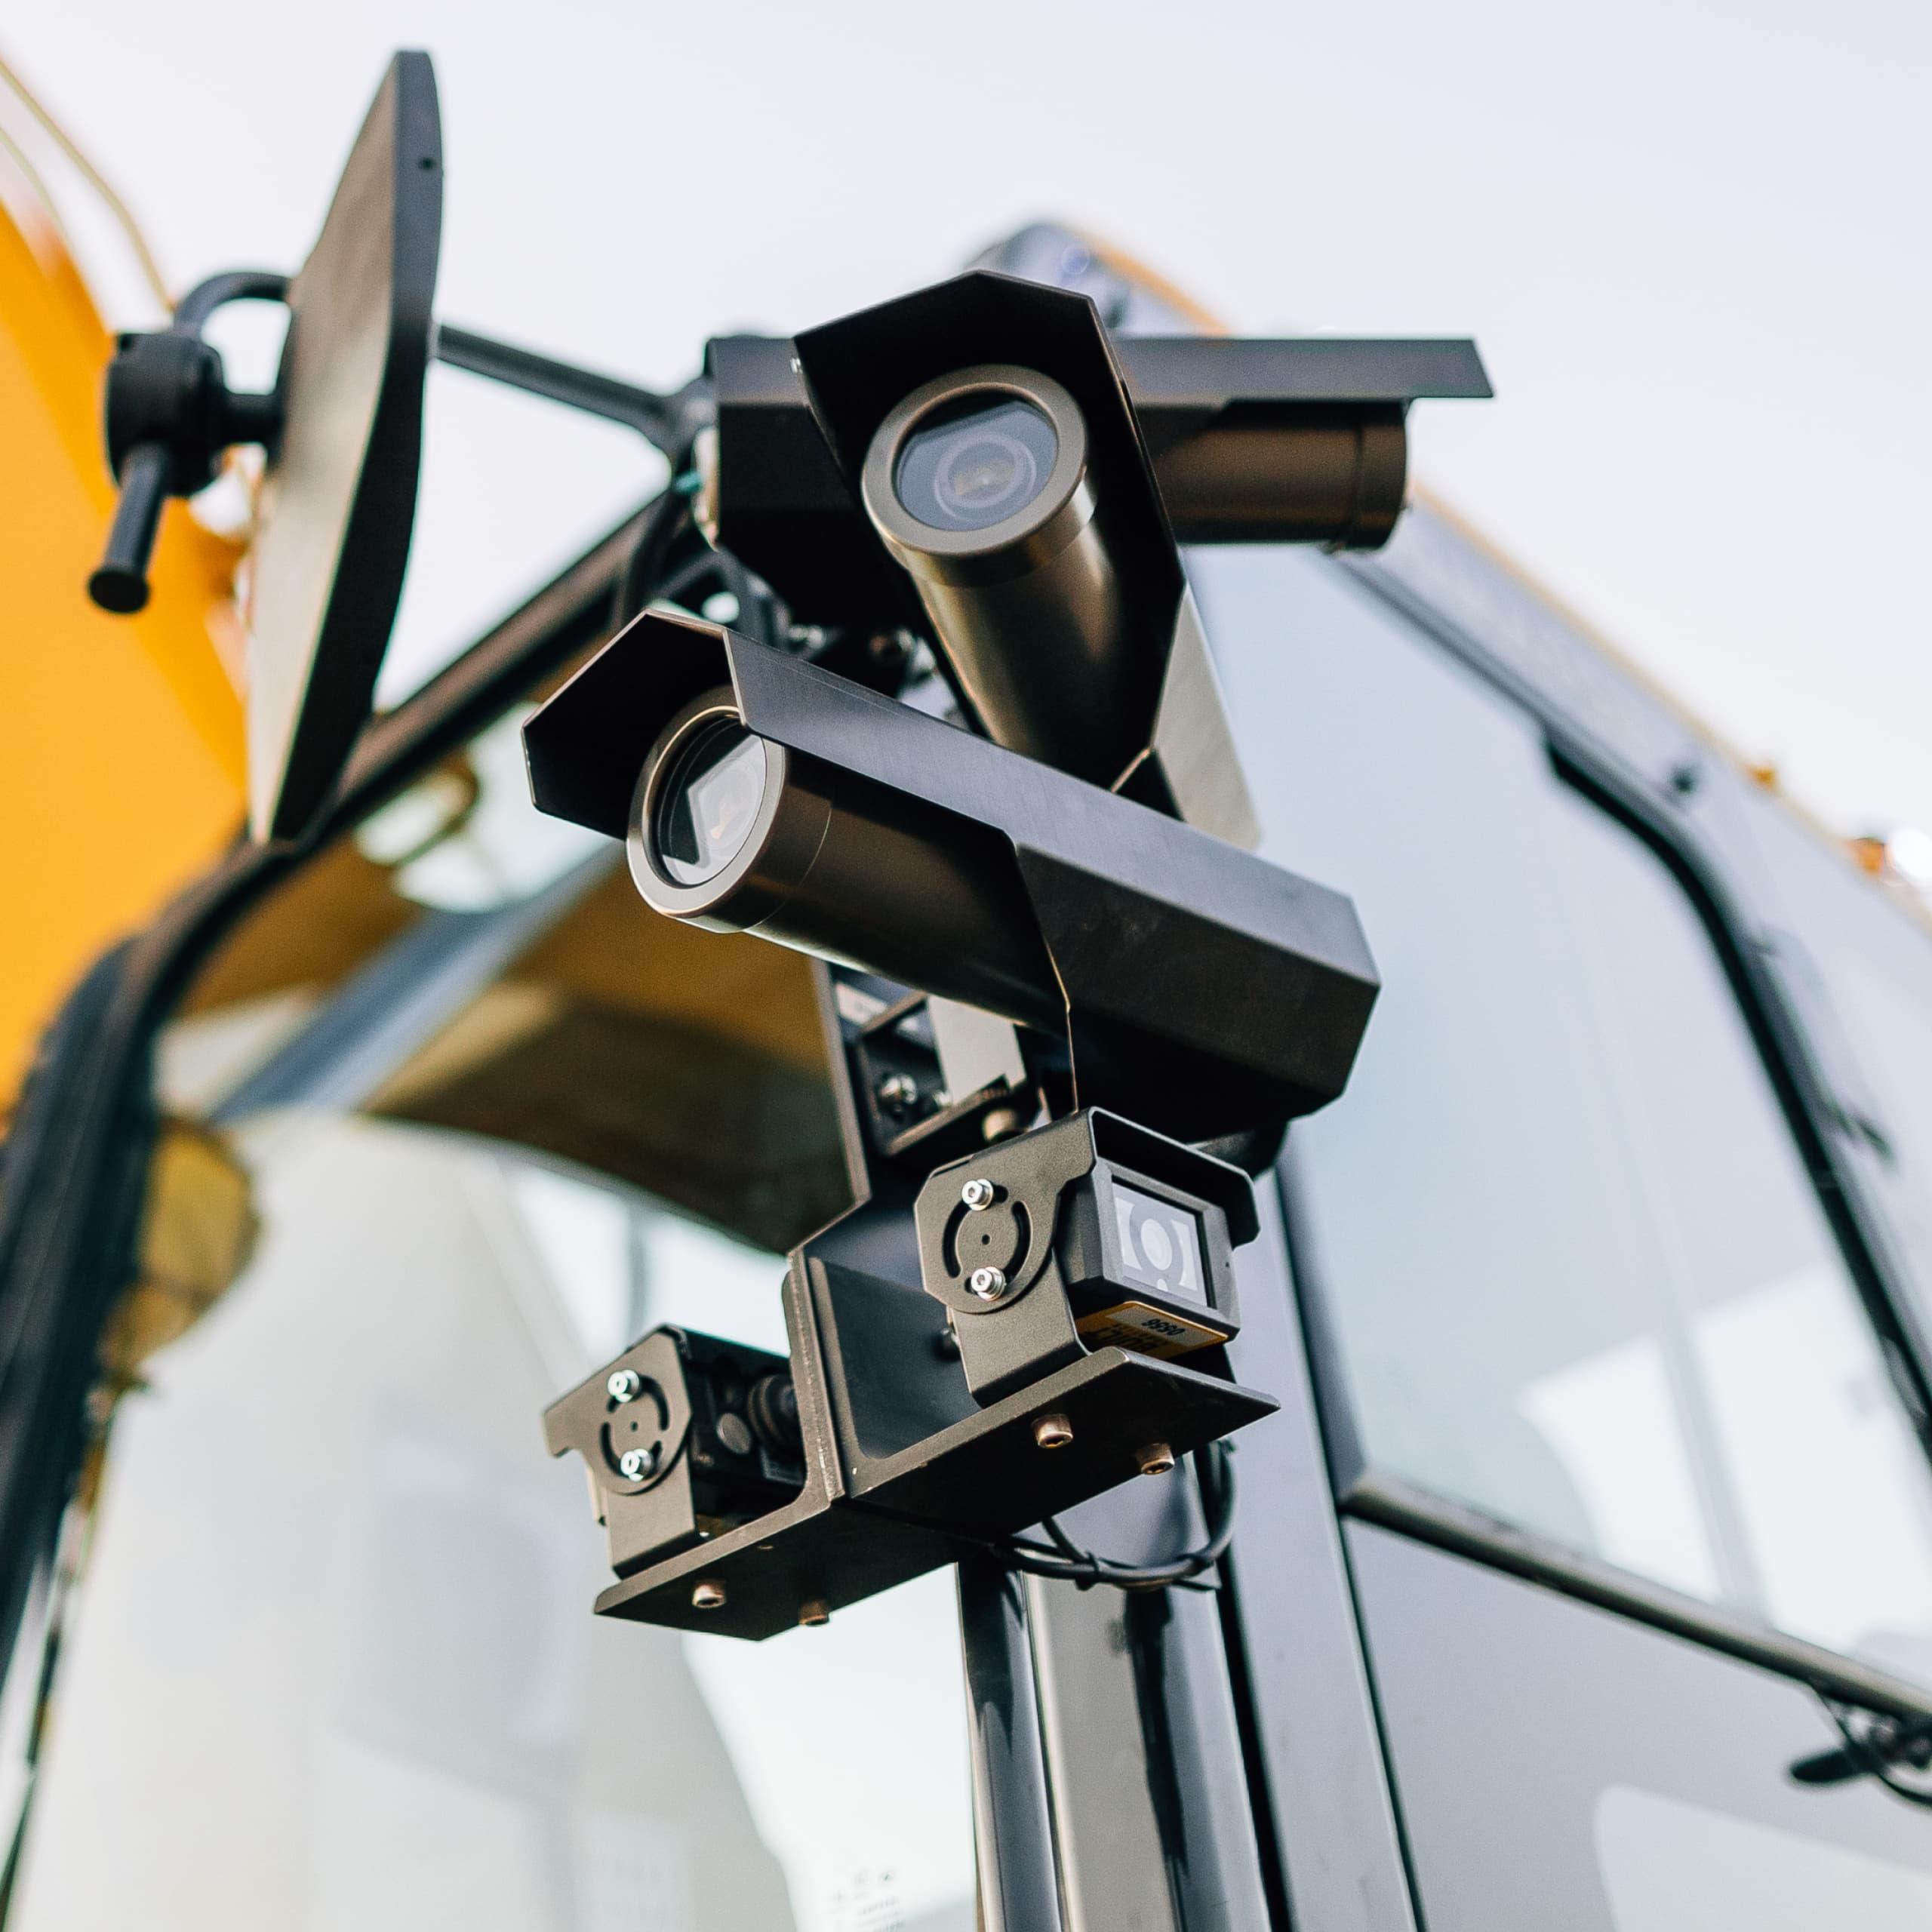 Exosystem obstacle cameras